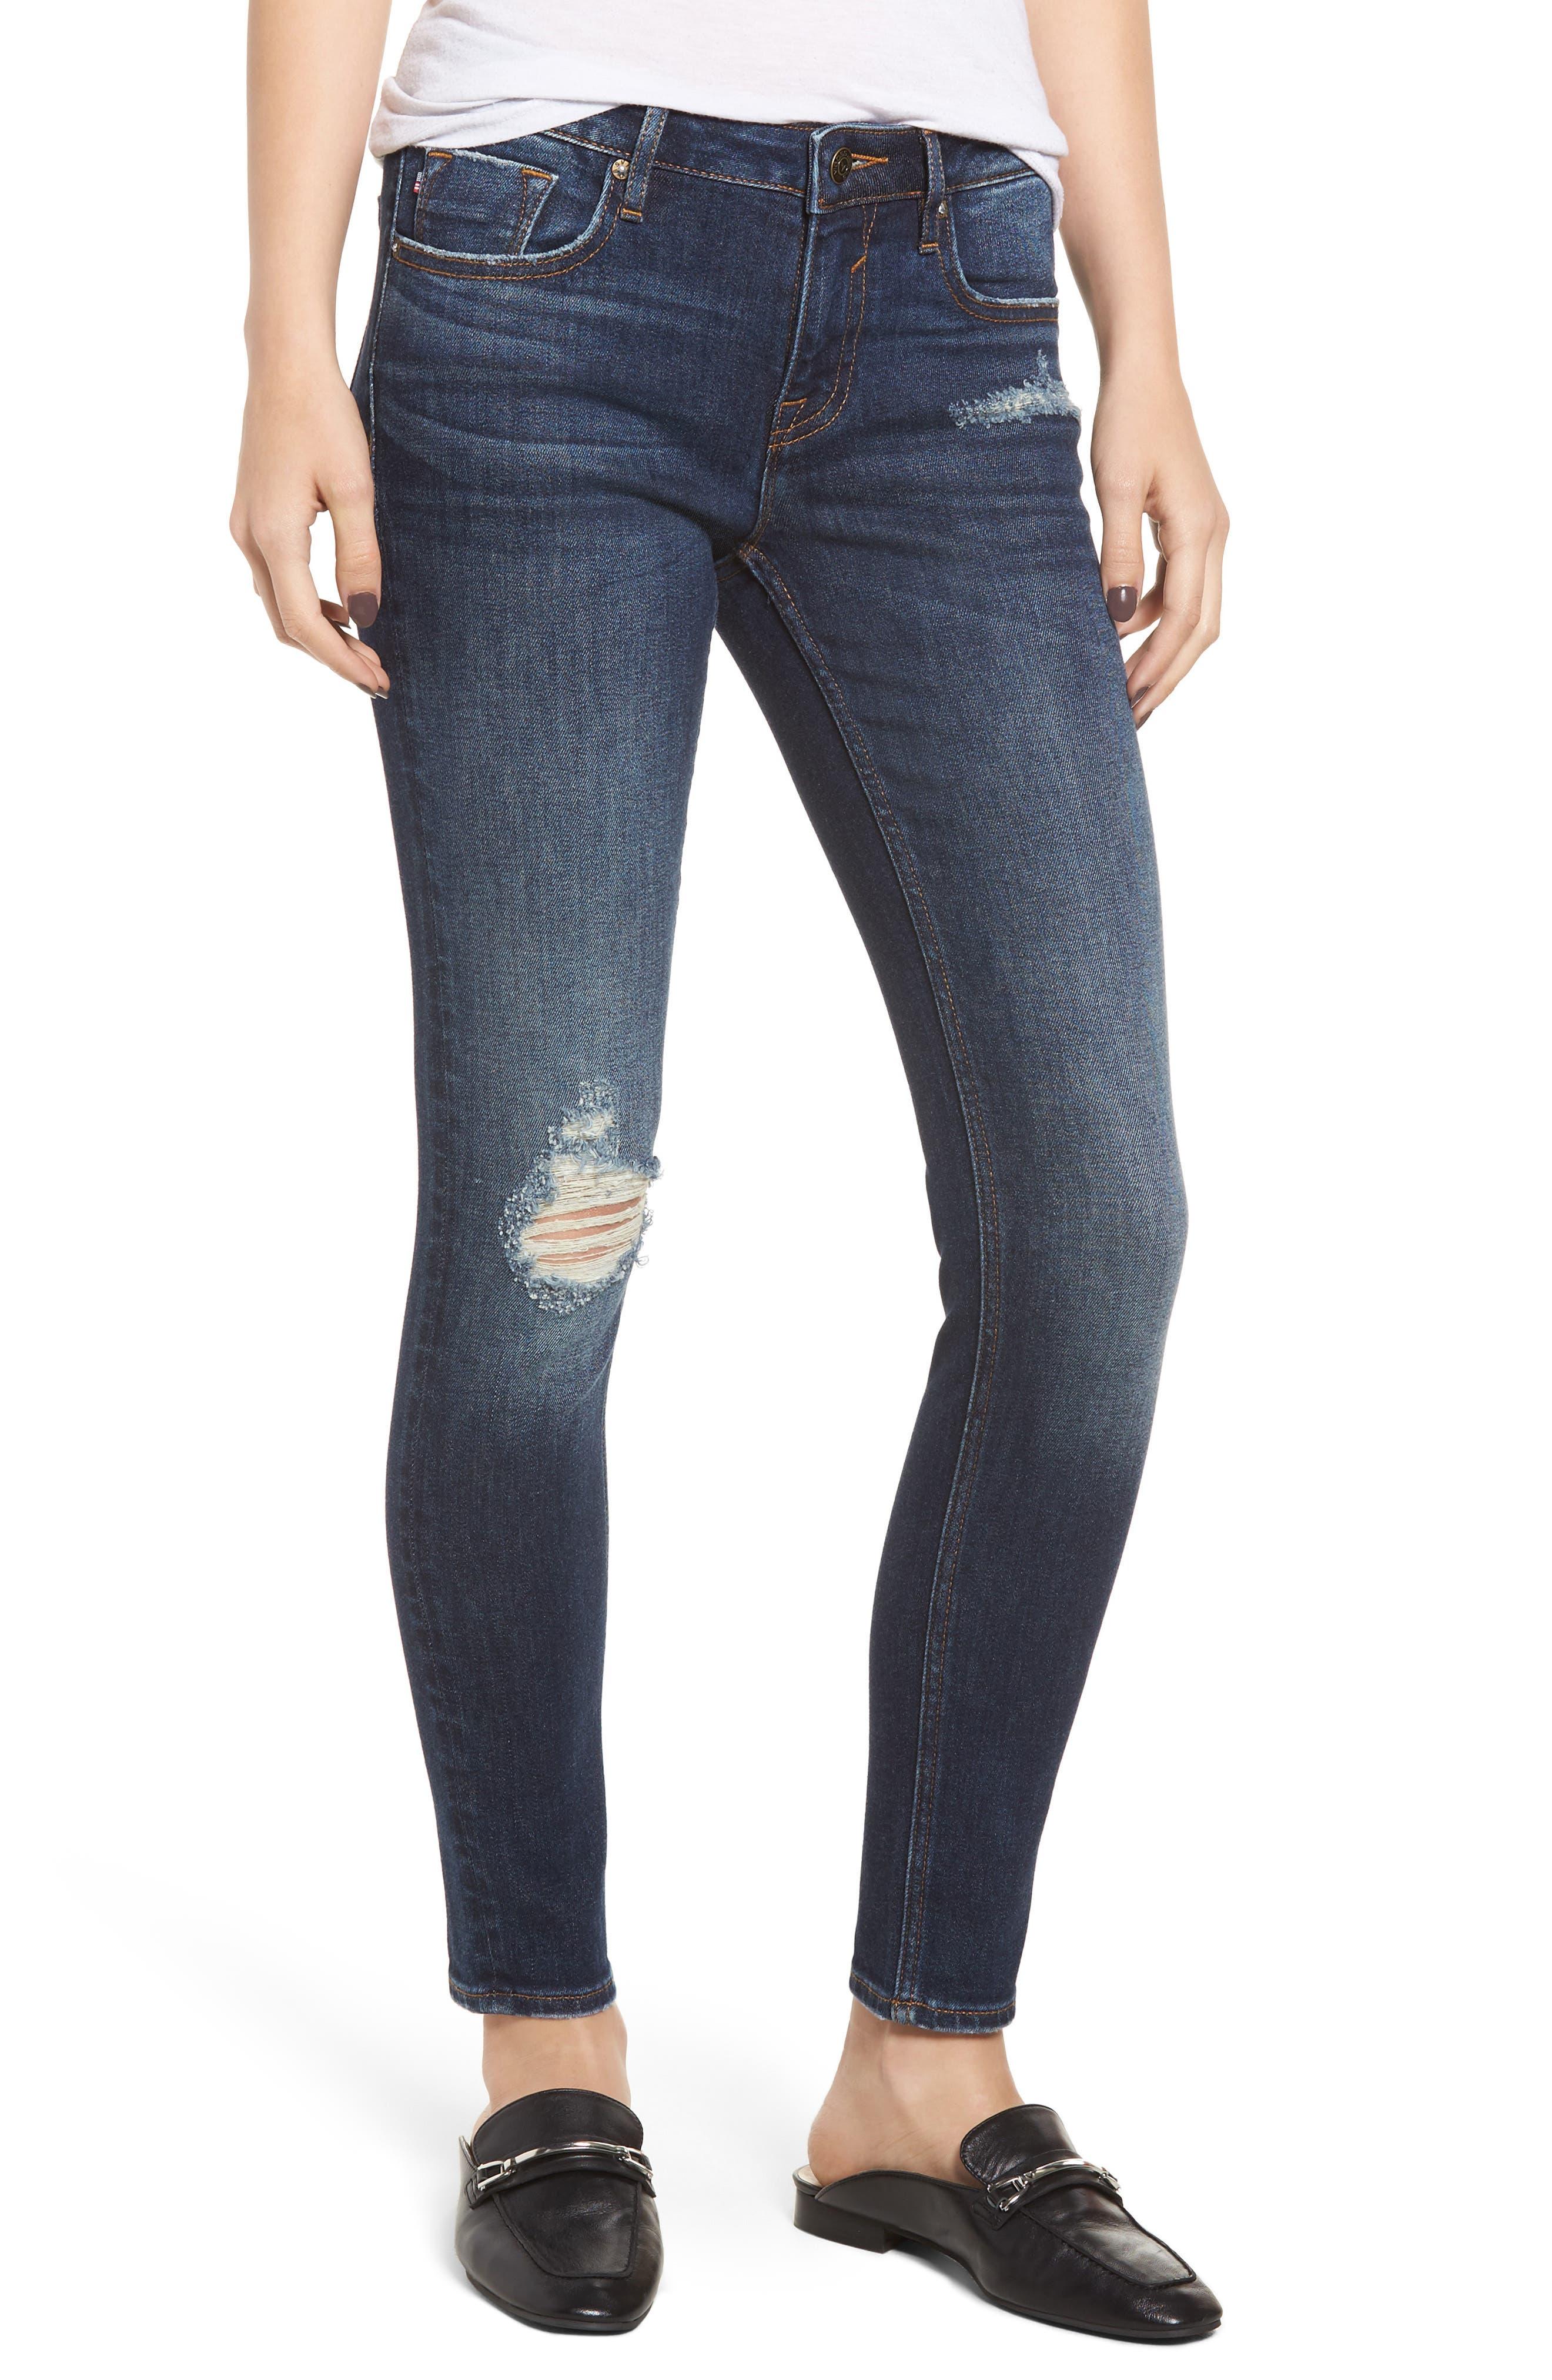 VIGOSS Jagger Ripped Skinny Jeans, Main, color, 403